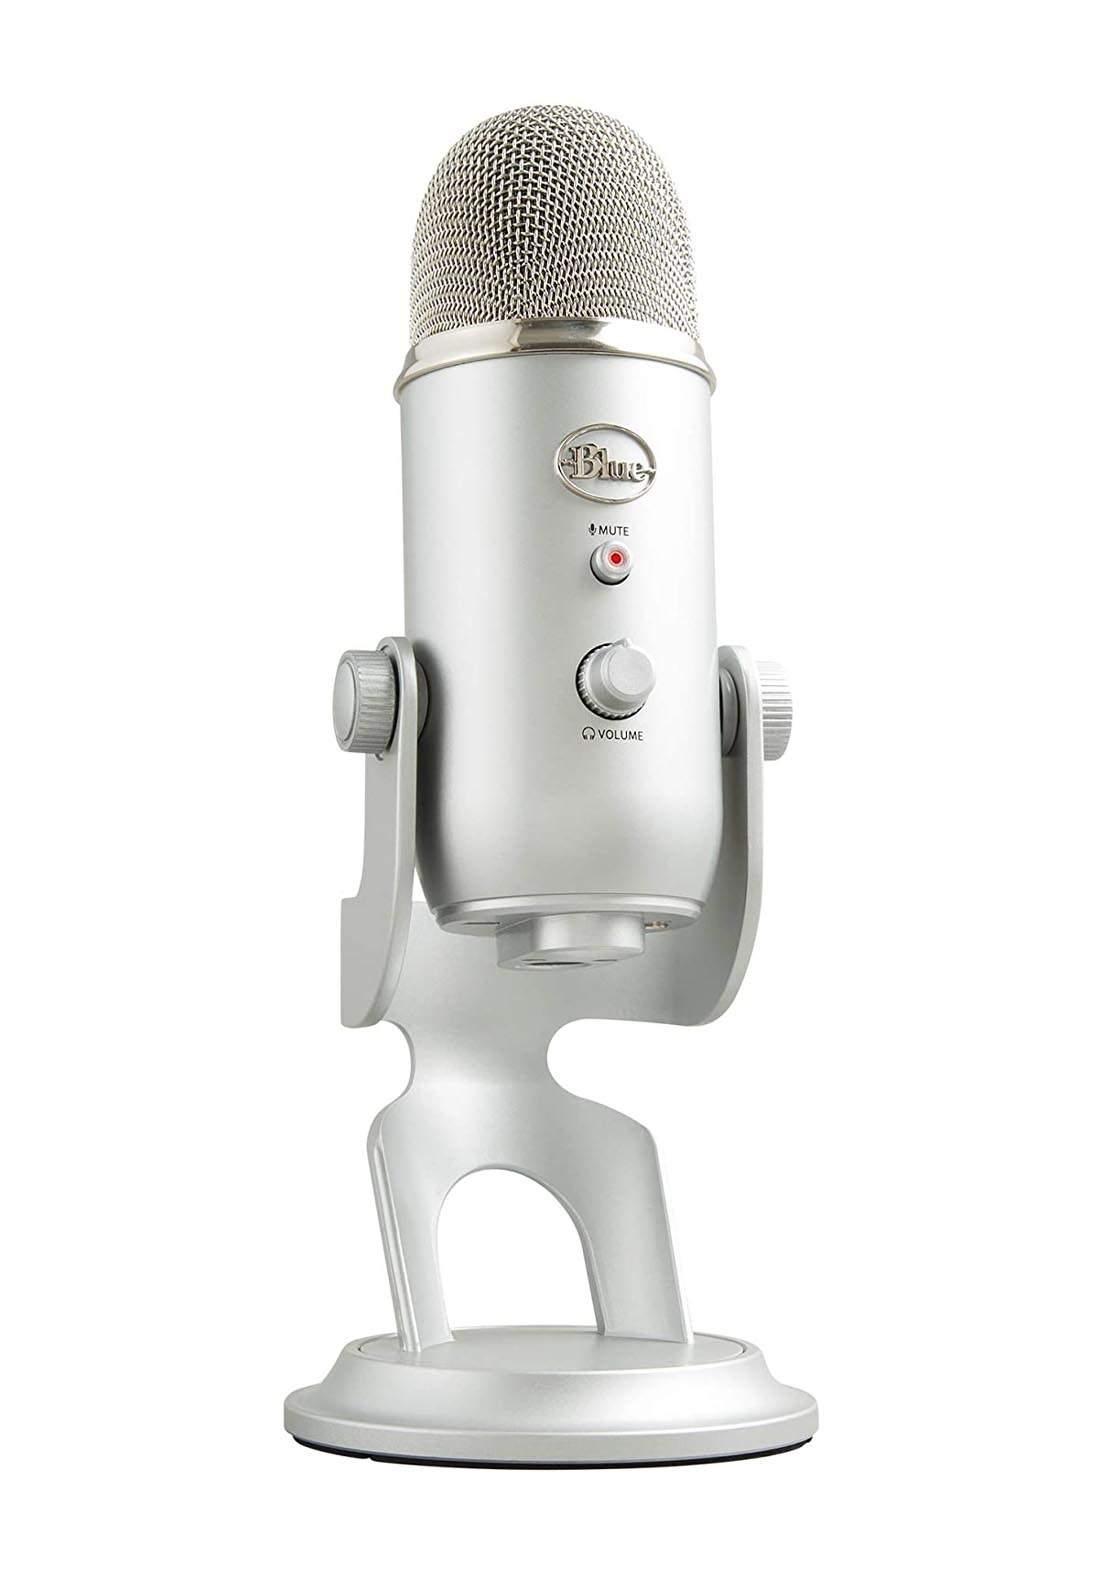 Blue Yeti  Professional Condenser USB Microphone  - Silver مايكرفون